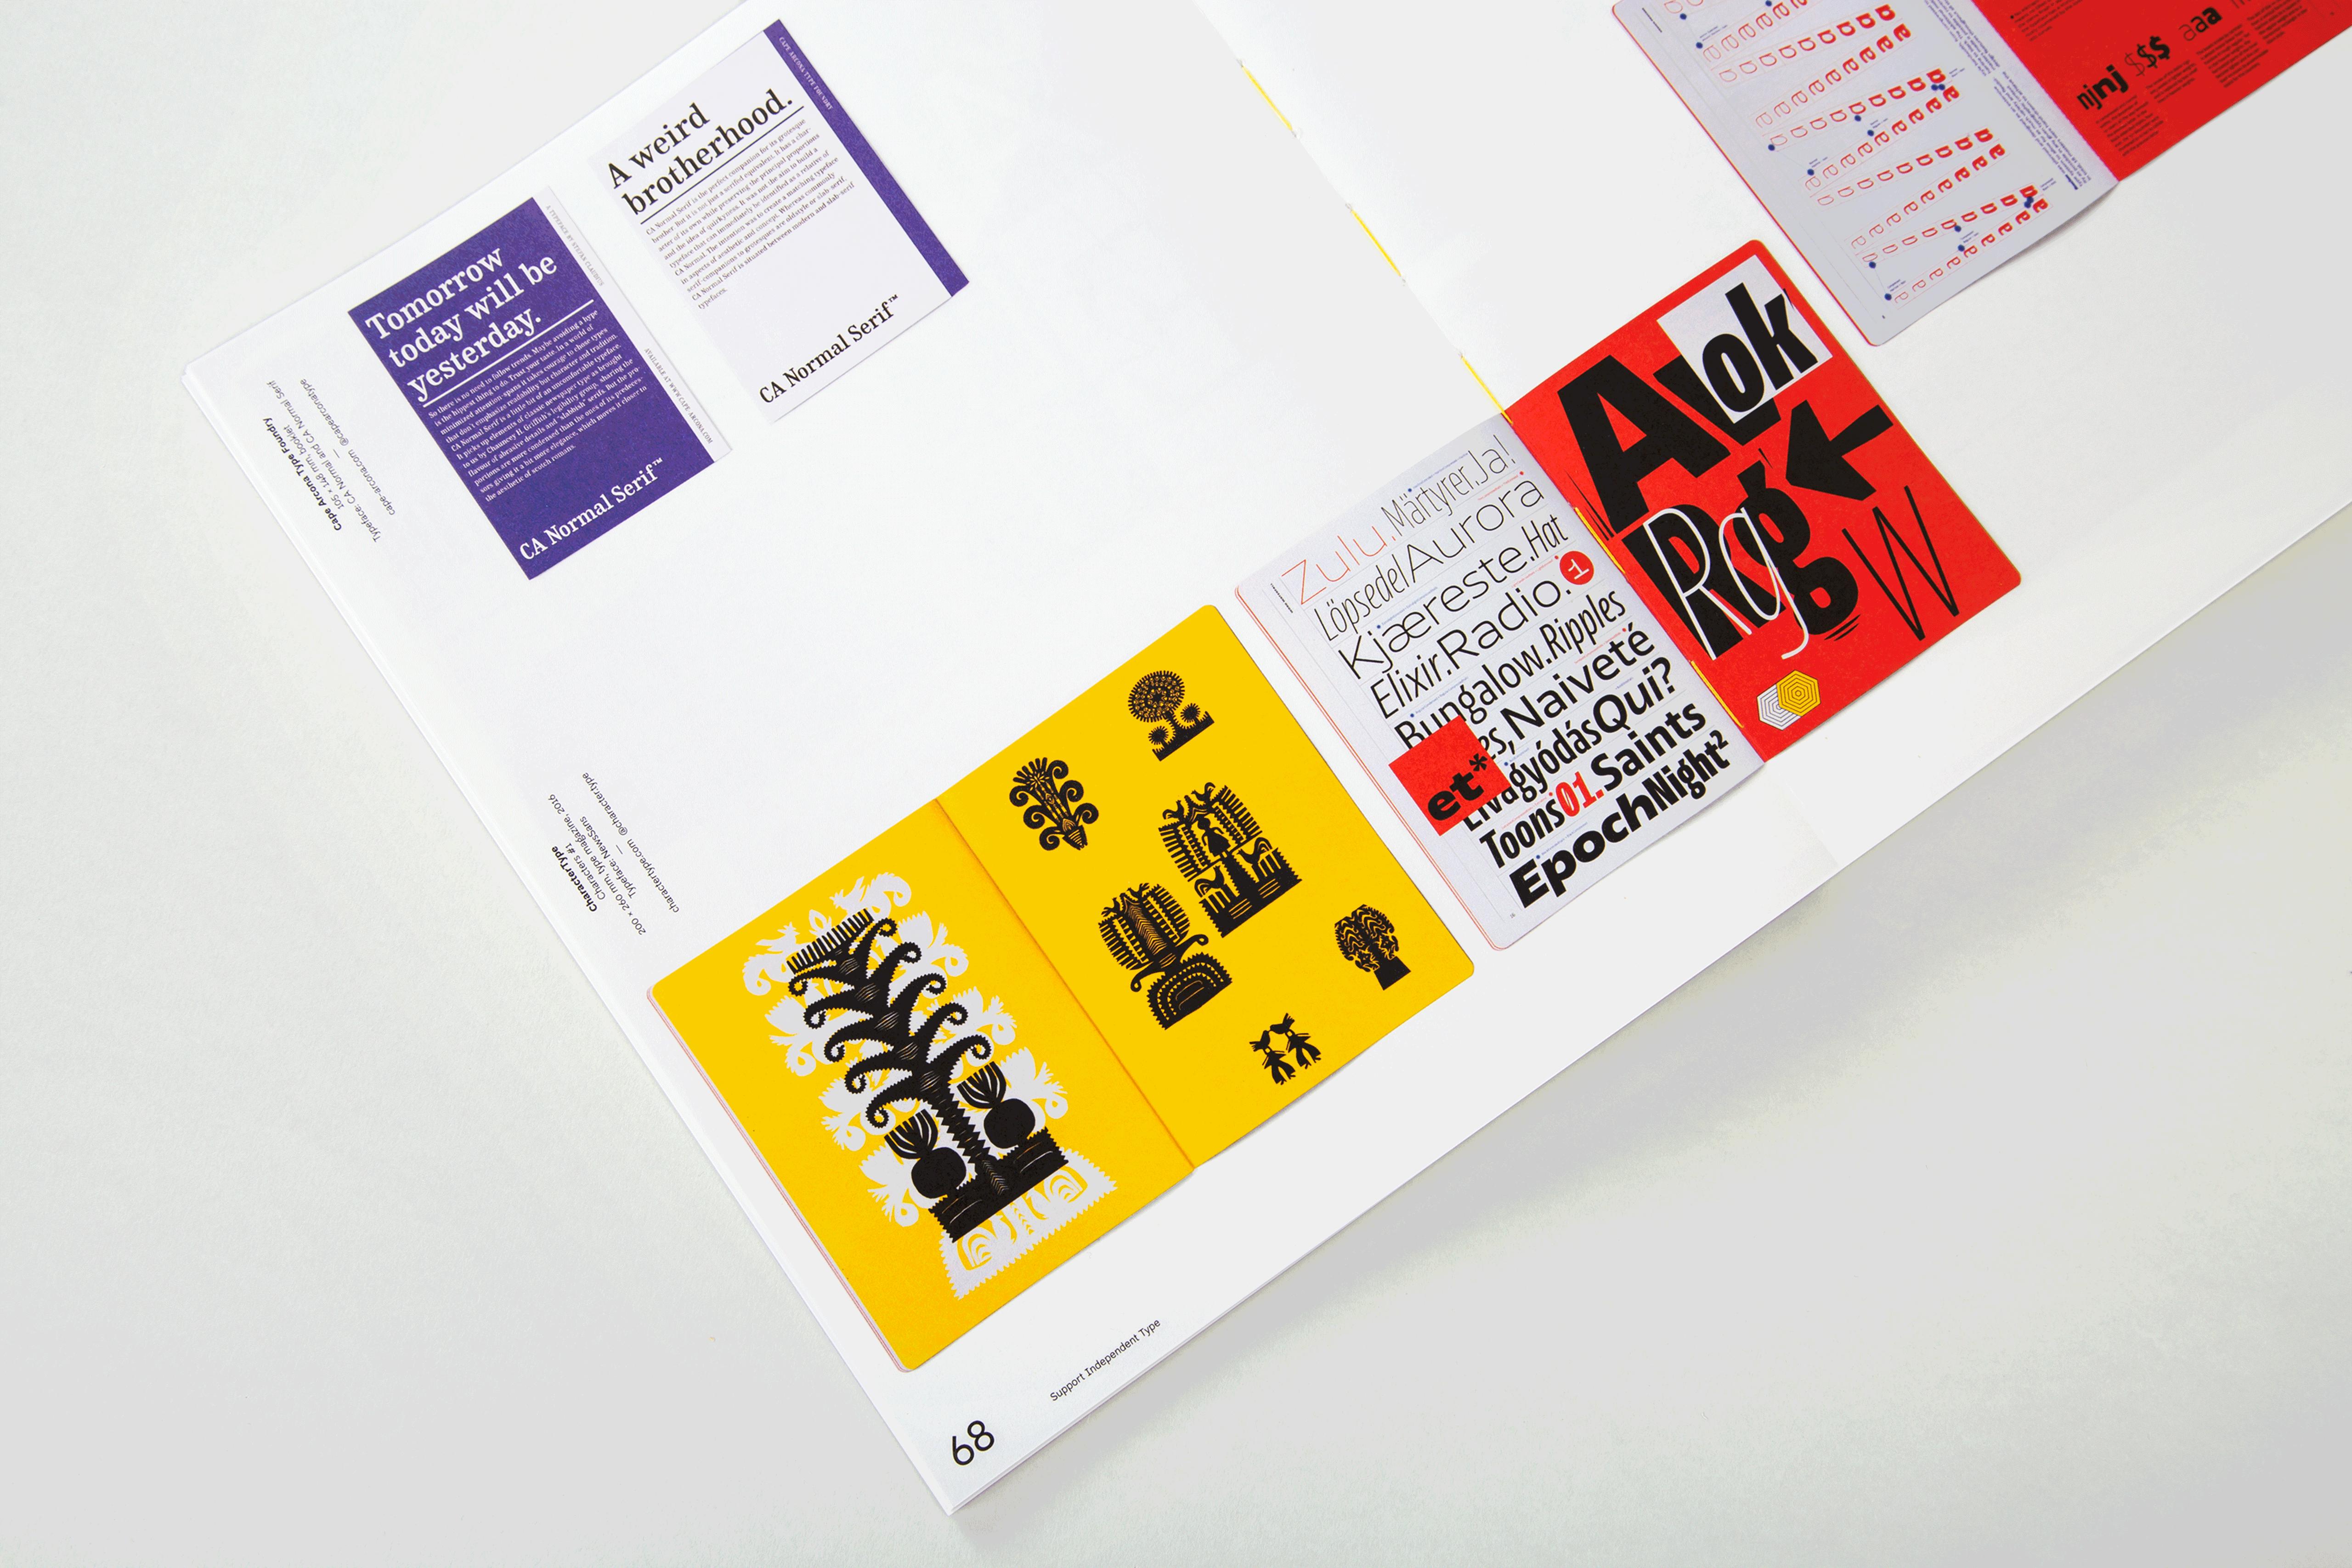 Slanted-Publiaktionen-Slanted-Publishers-Support-Independent-Type_15